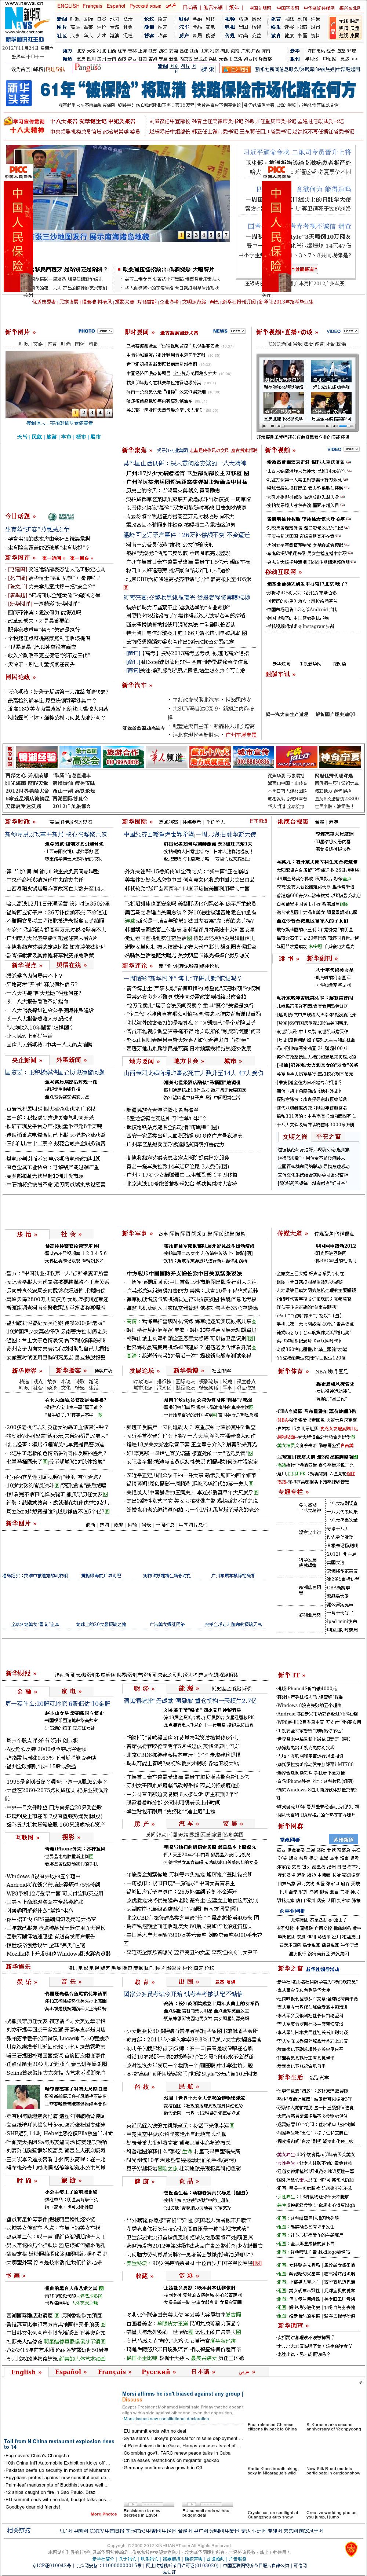 Xinhua at Saturday Nov. 24, 2012, 5:35 a.m. UTC